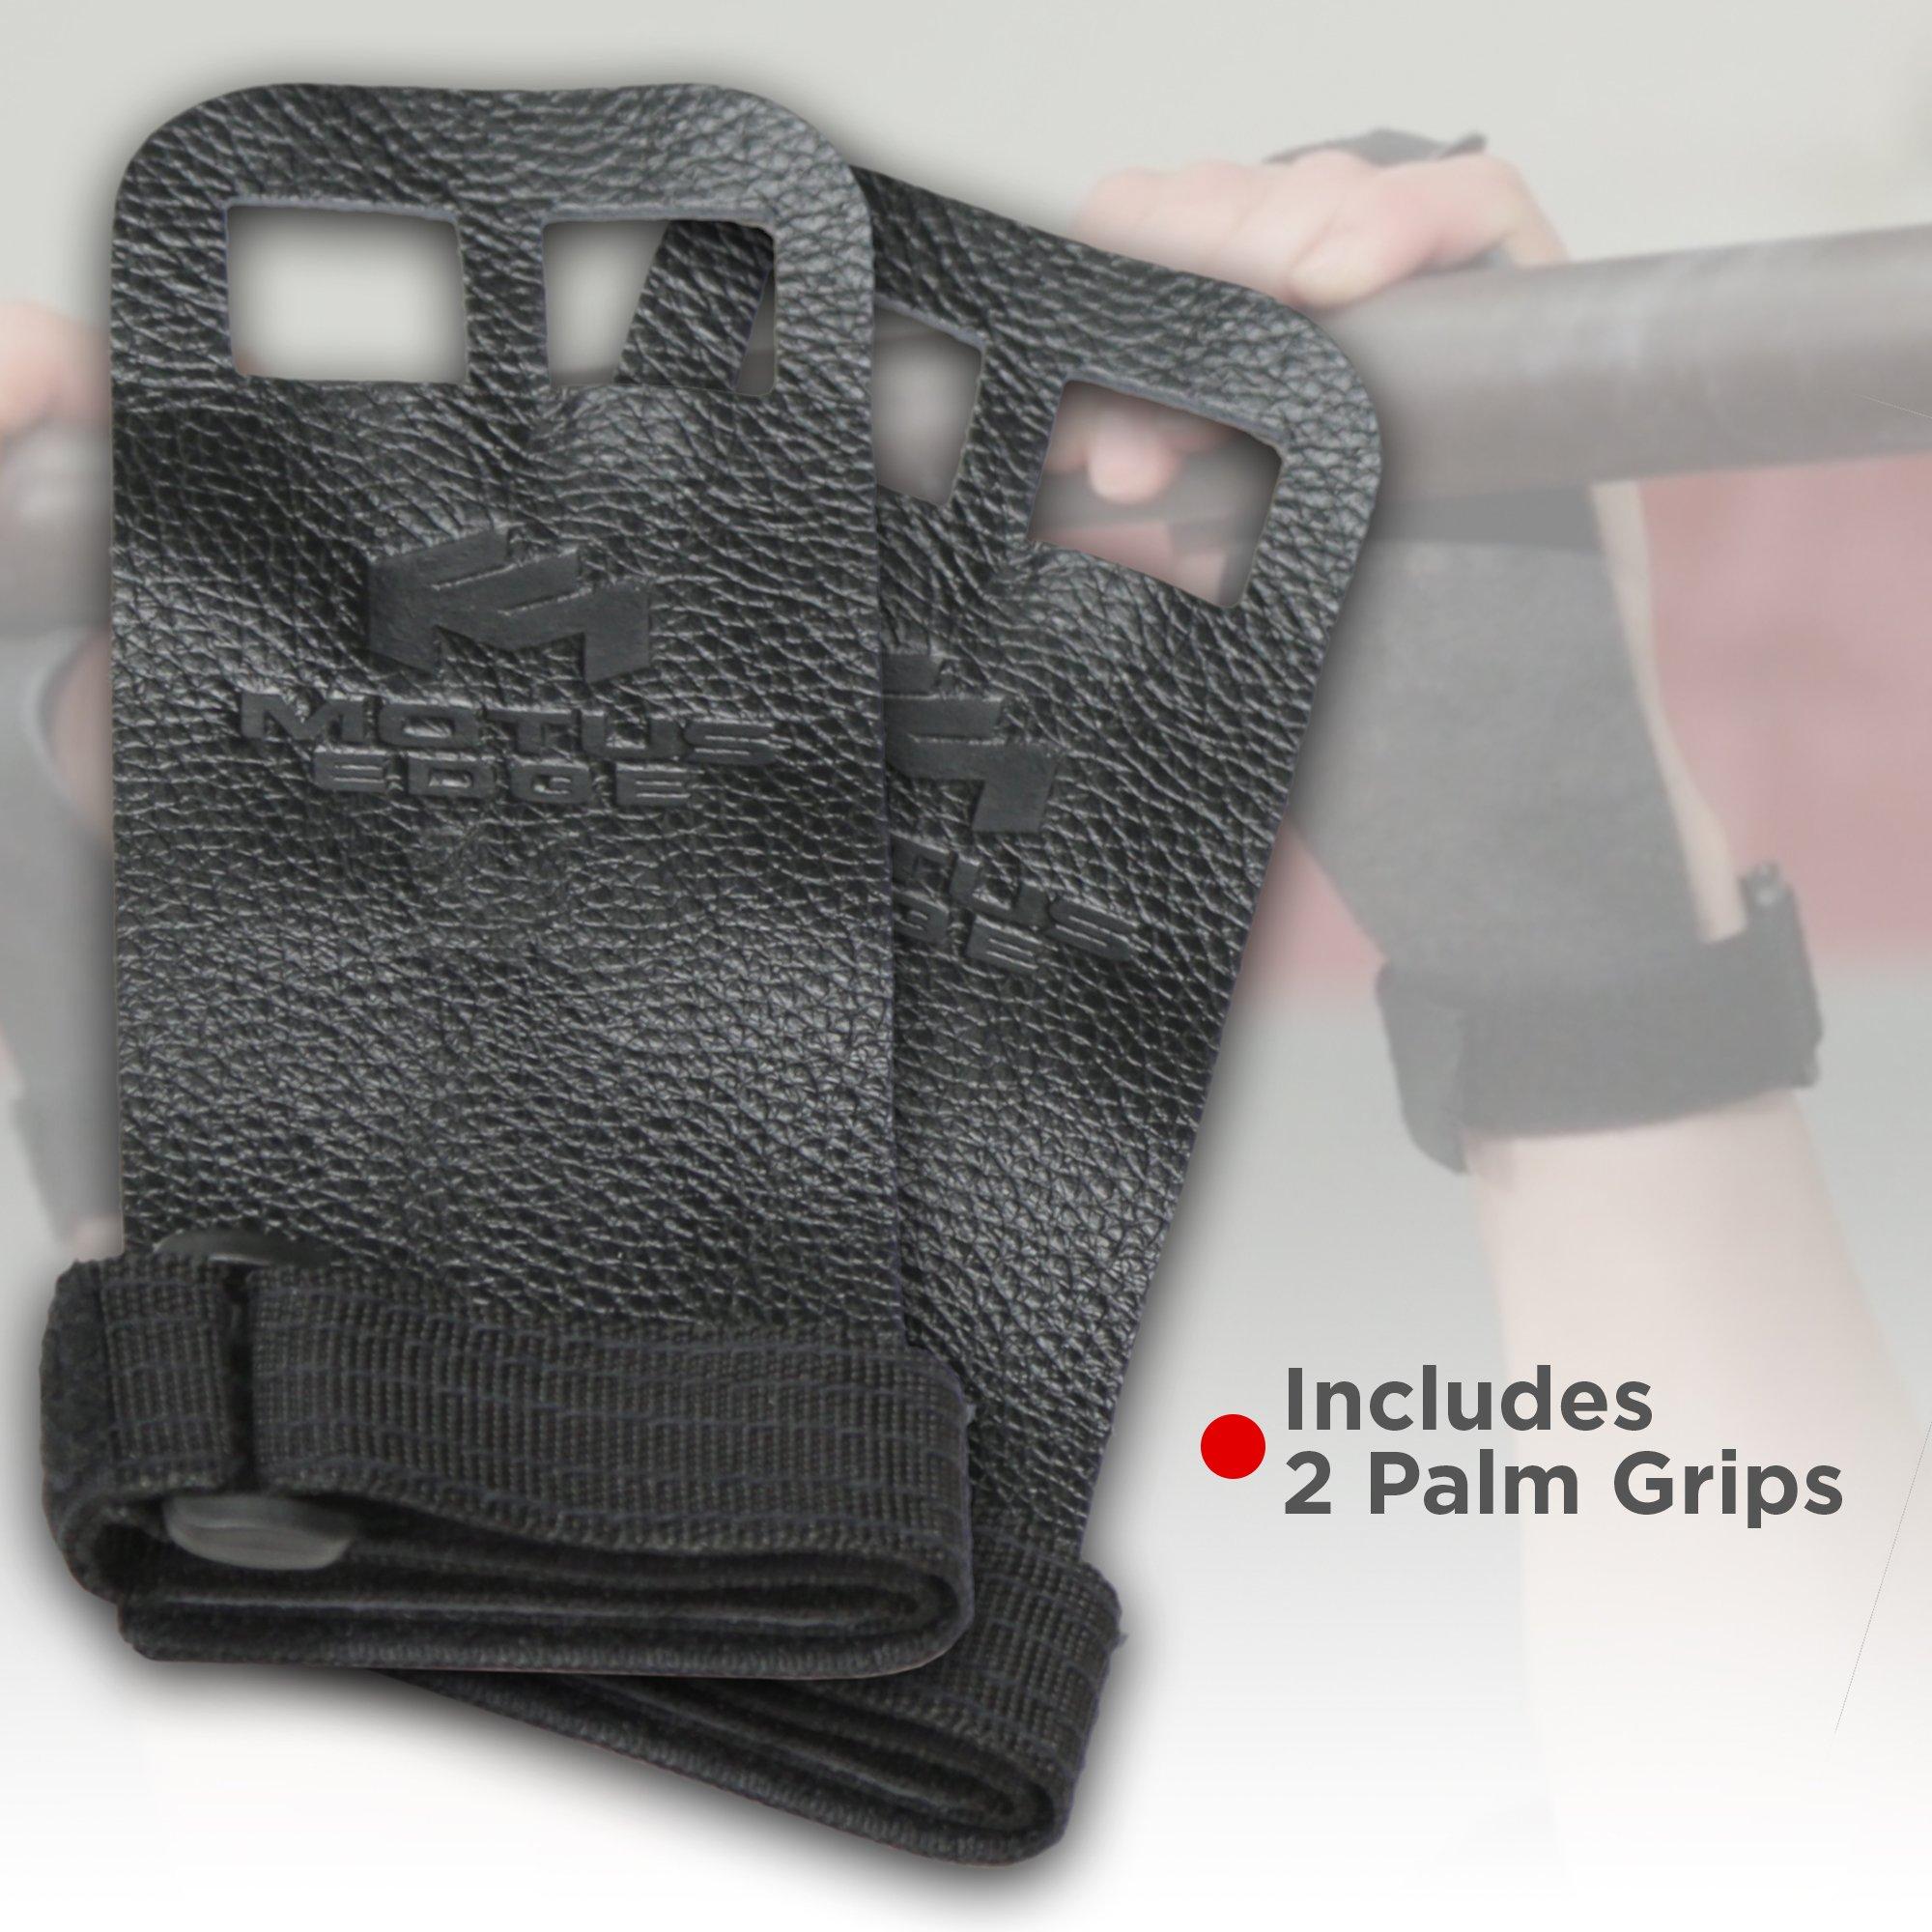 Motus Edge CrossFit Starter Kit - Palm Grips, Wrist Wraps, Speed Jump Rope - Handy Carry Bag by Motus Edge (Image #2)